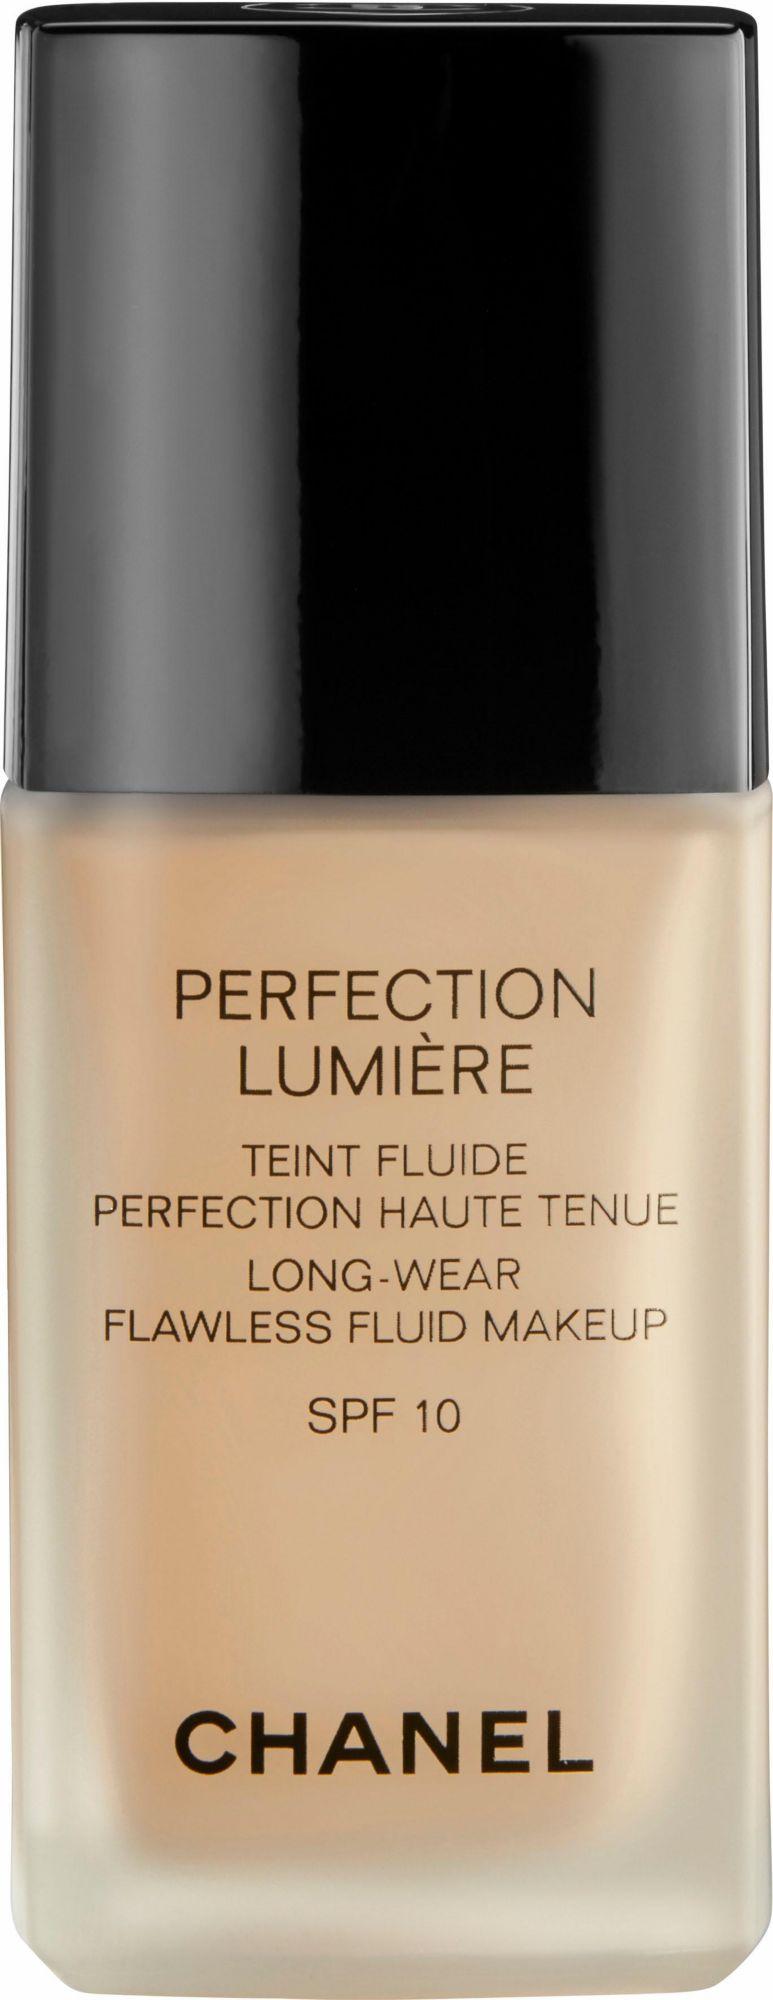 CHANEL Chanel, »Perfection Lumière Fluide«, Foundation